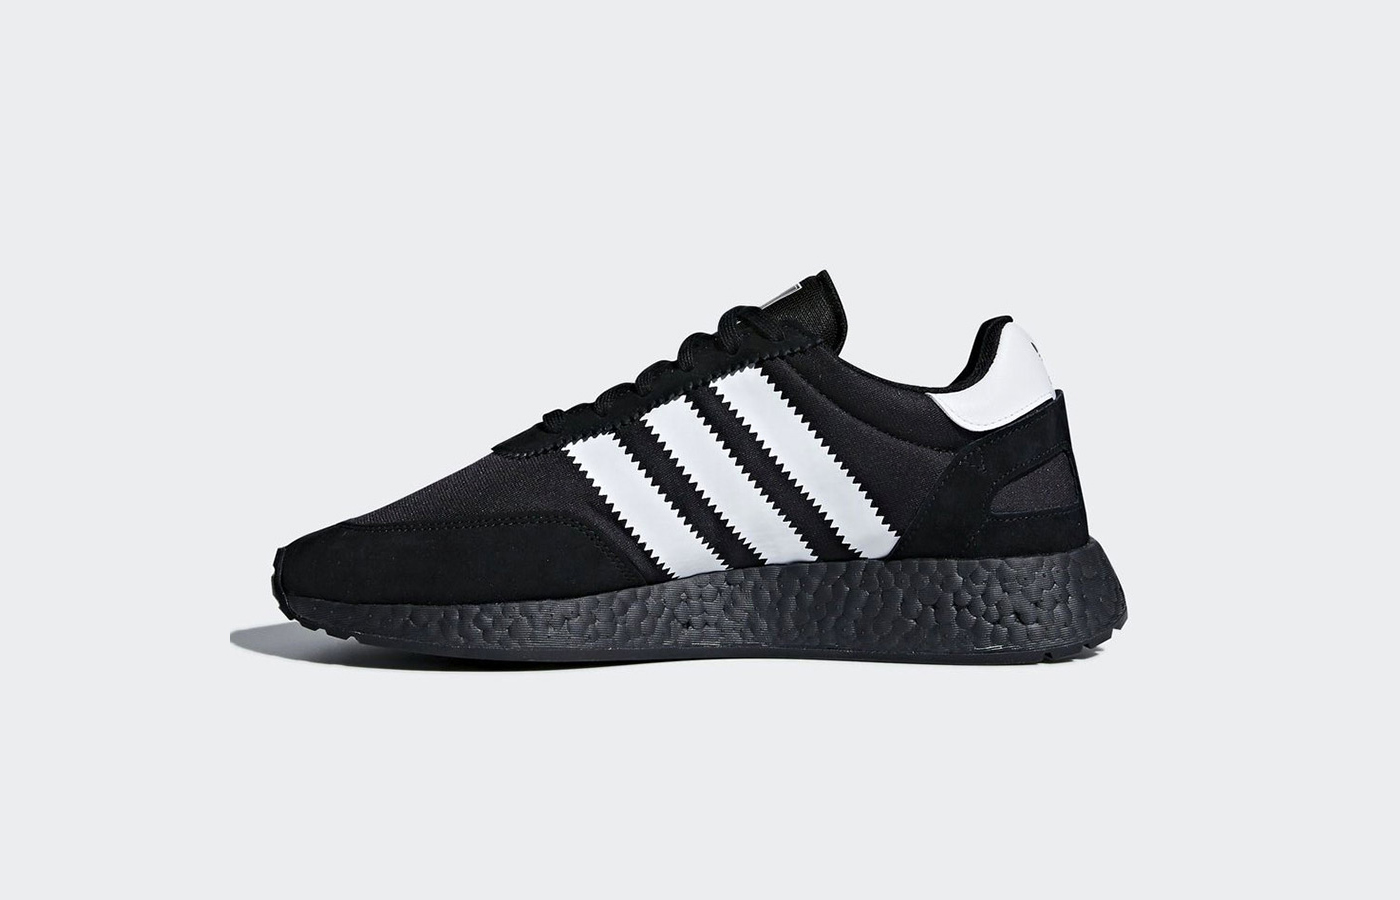 Adidas I 5923 Black Boost Sneakers Addict